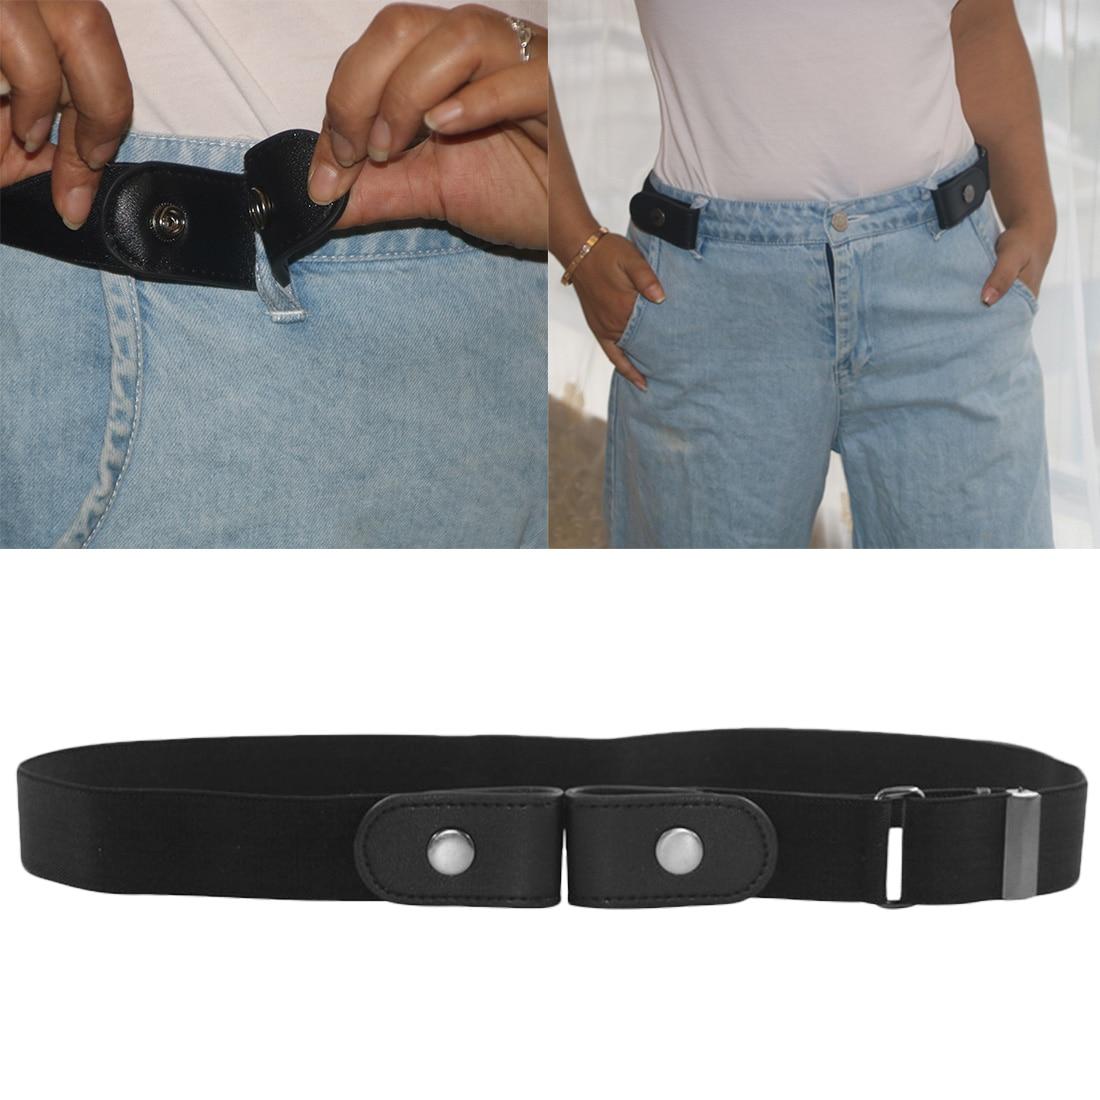 New Unisex Buckle-Free Elastic Belt For Jeans Pants Dress Stretch Waist Belt For Women Men No Buckle Without Buckle free Belts